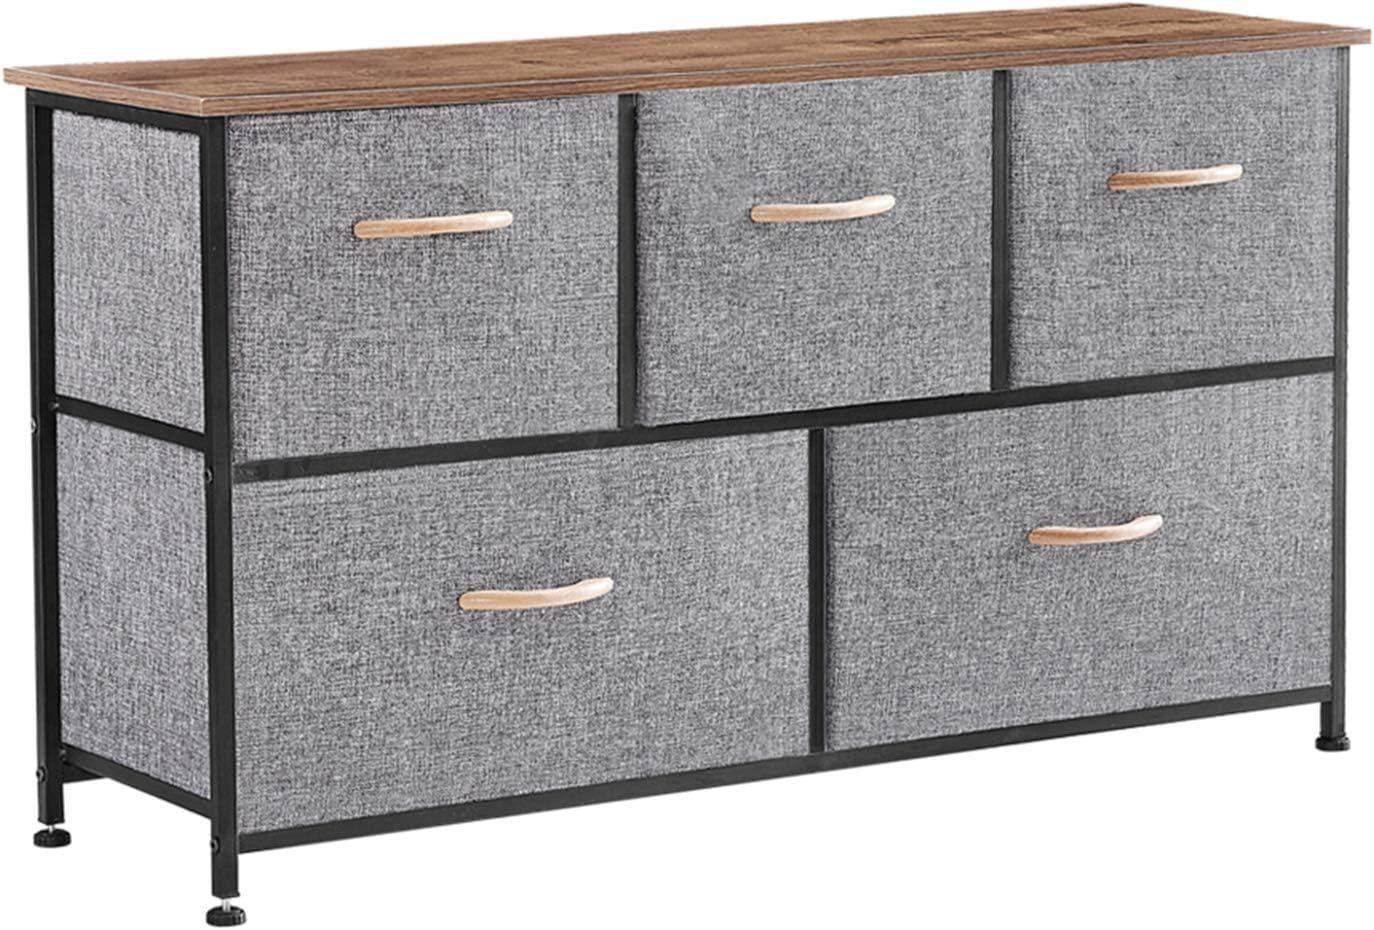 Mushugu gt3-DL 5 Drawer Dresser Tower E Award-winning store Hallway for Bedroom Unit Year-end gift